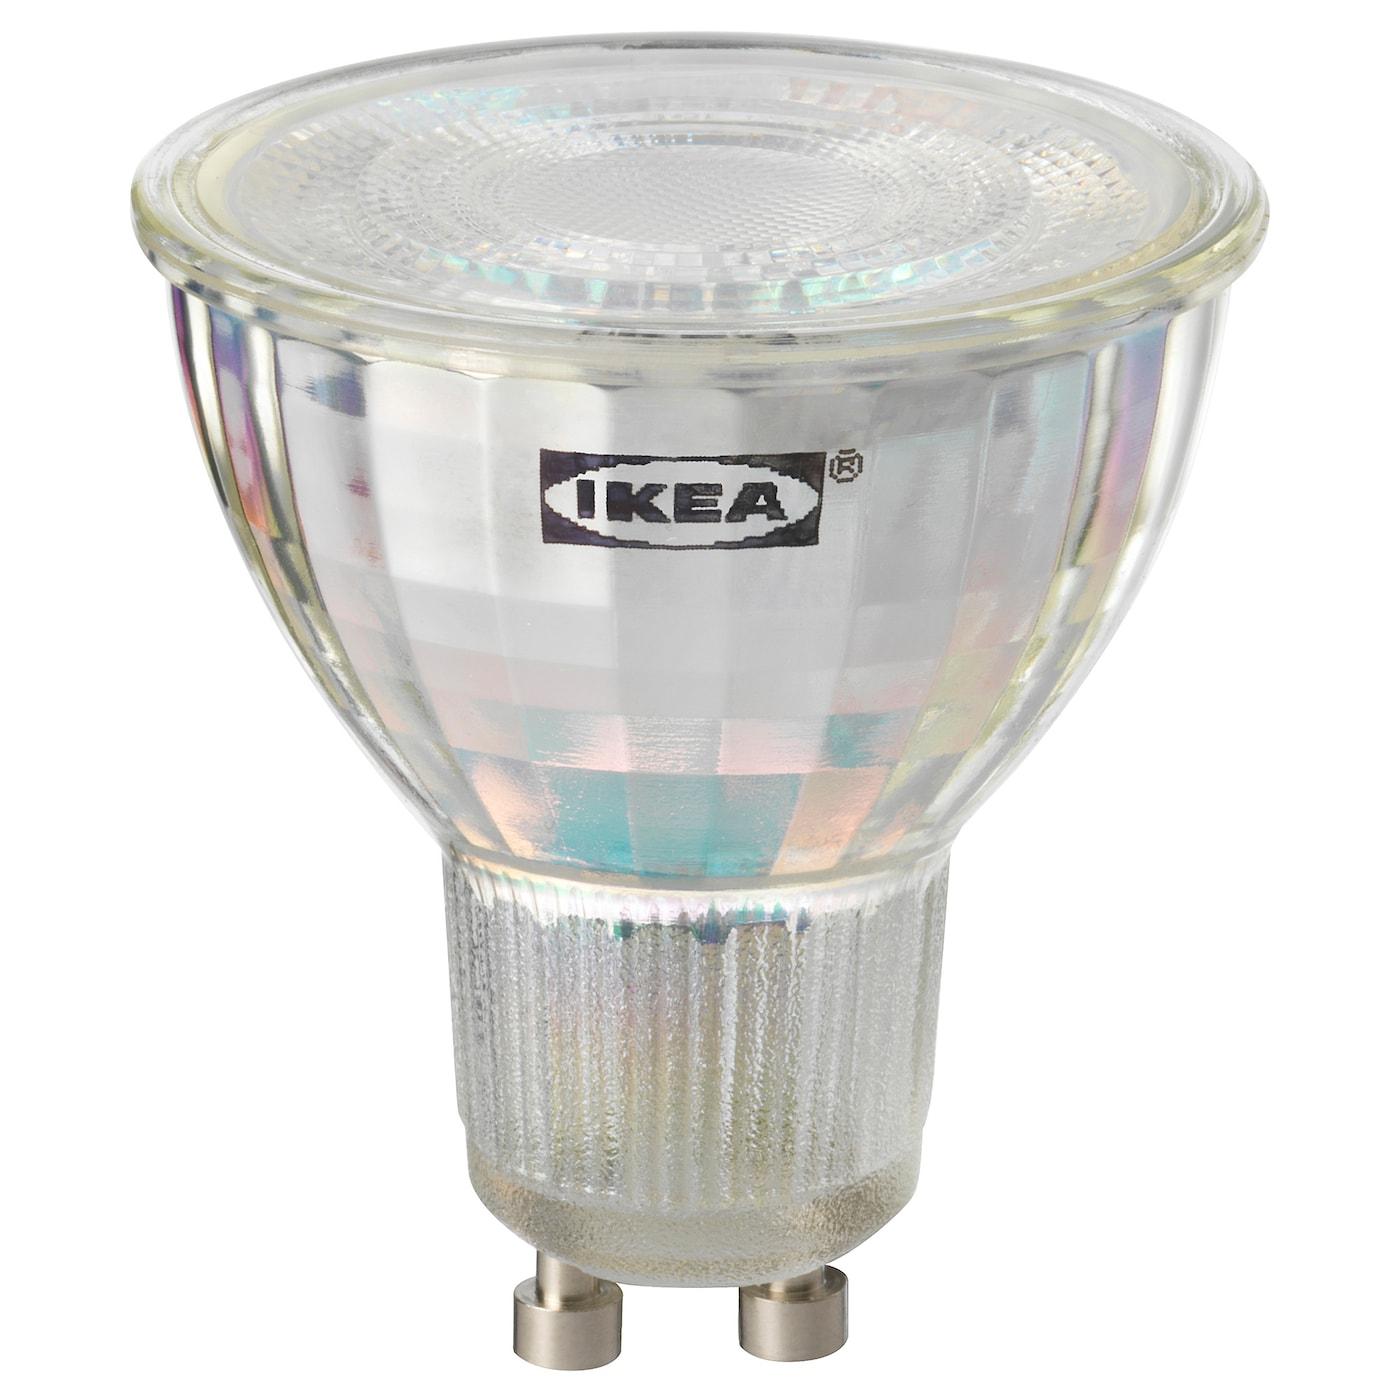 www.ikea.com